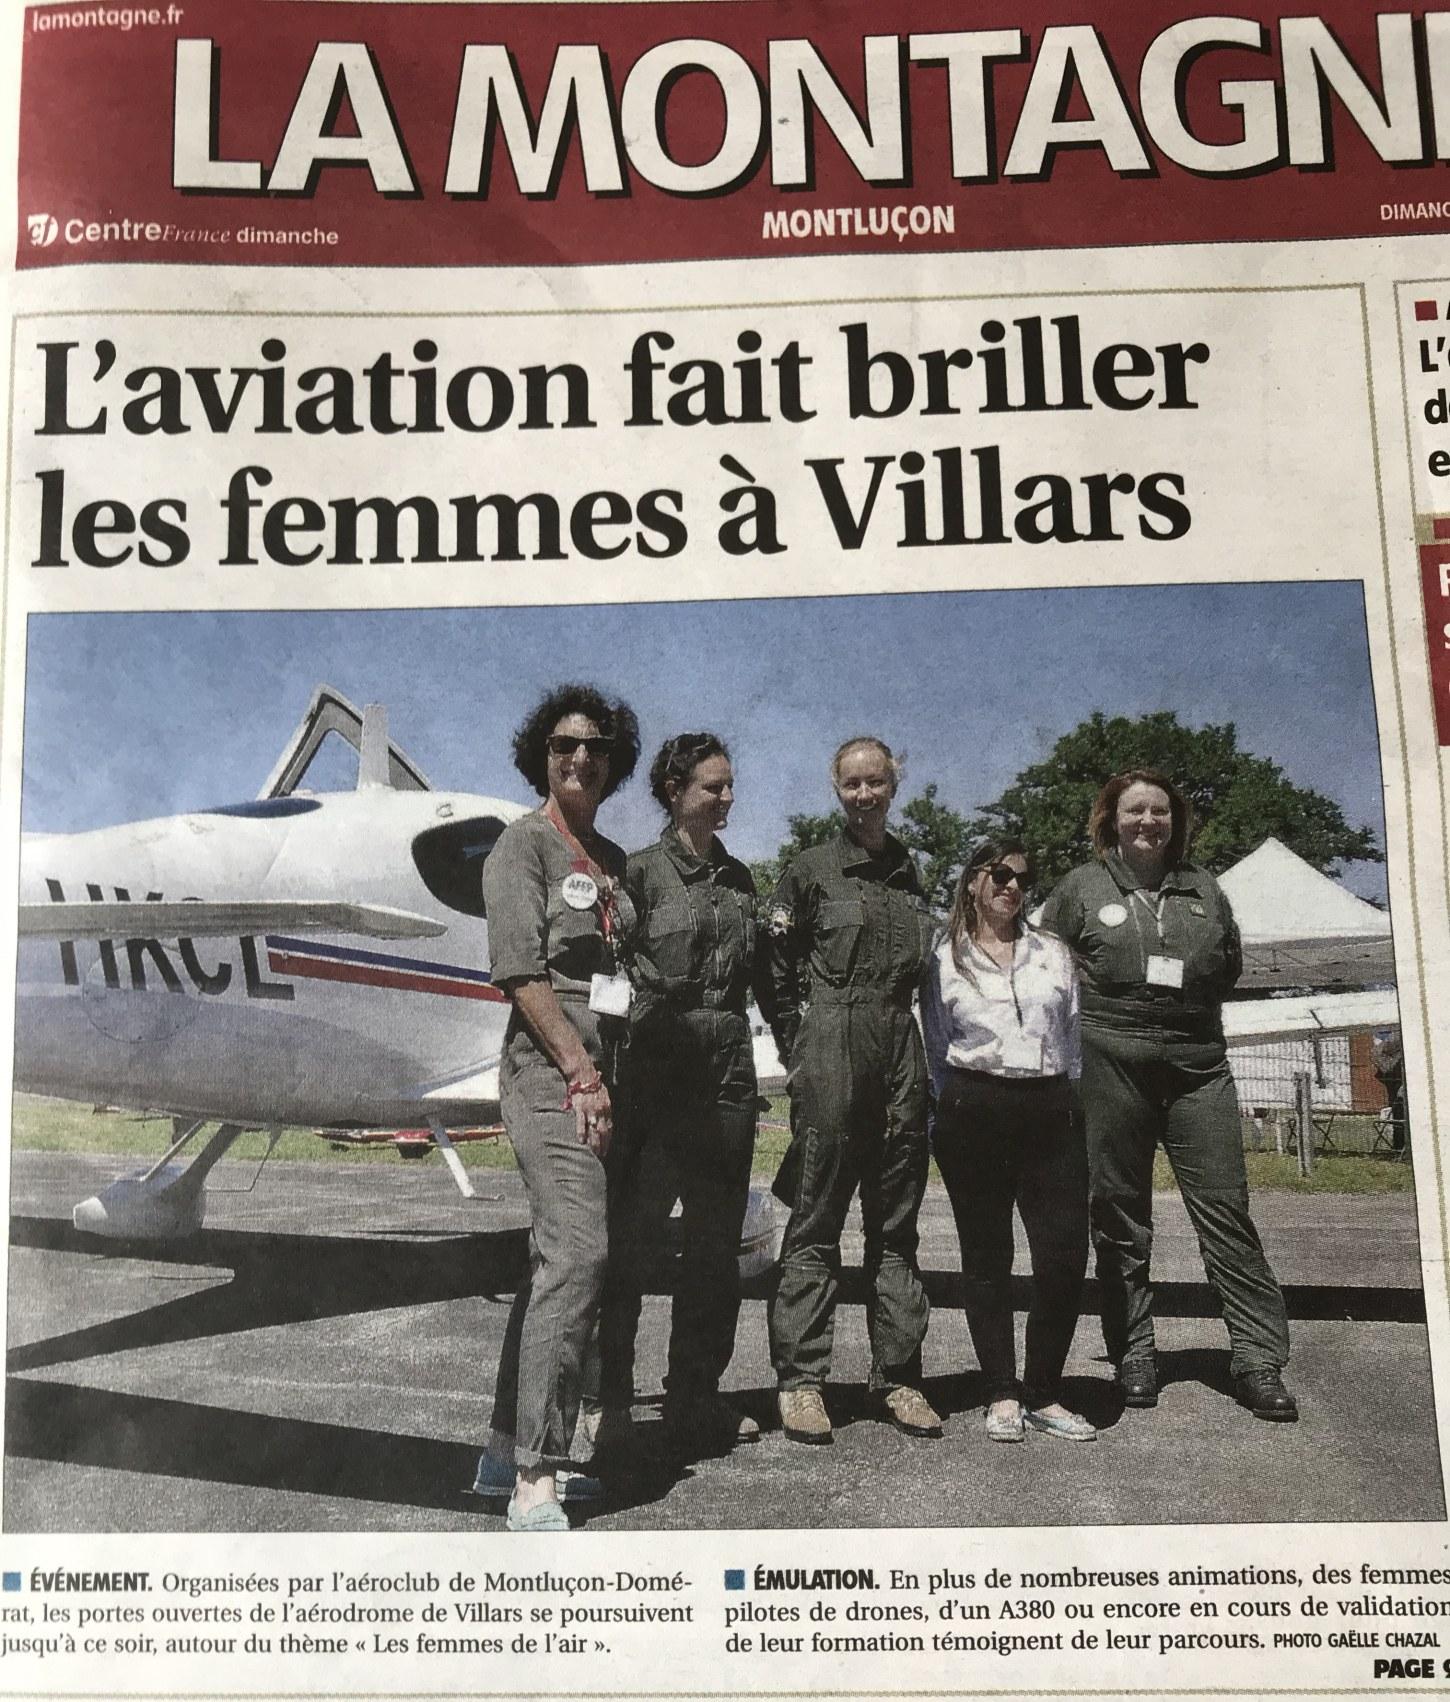 lidar-topographie-imagerie-aerienne-isabelle-heitz-article-presse